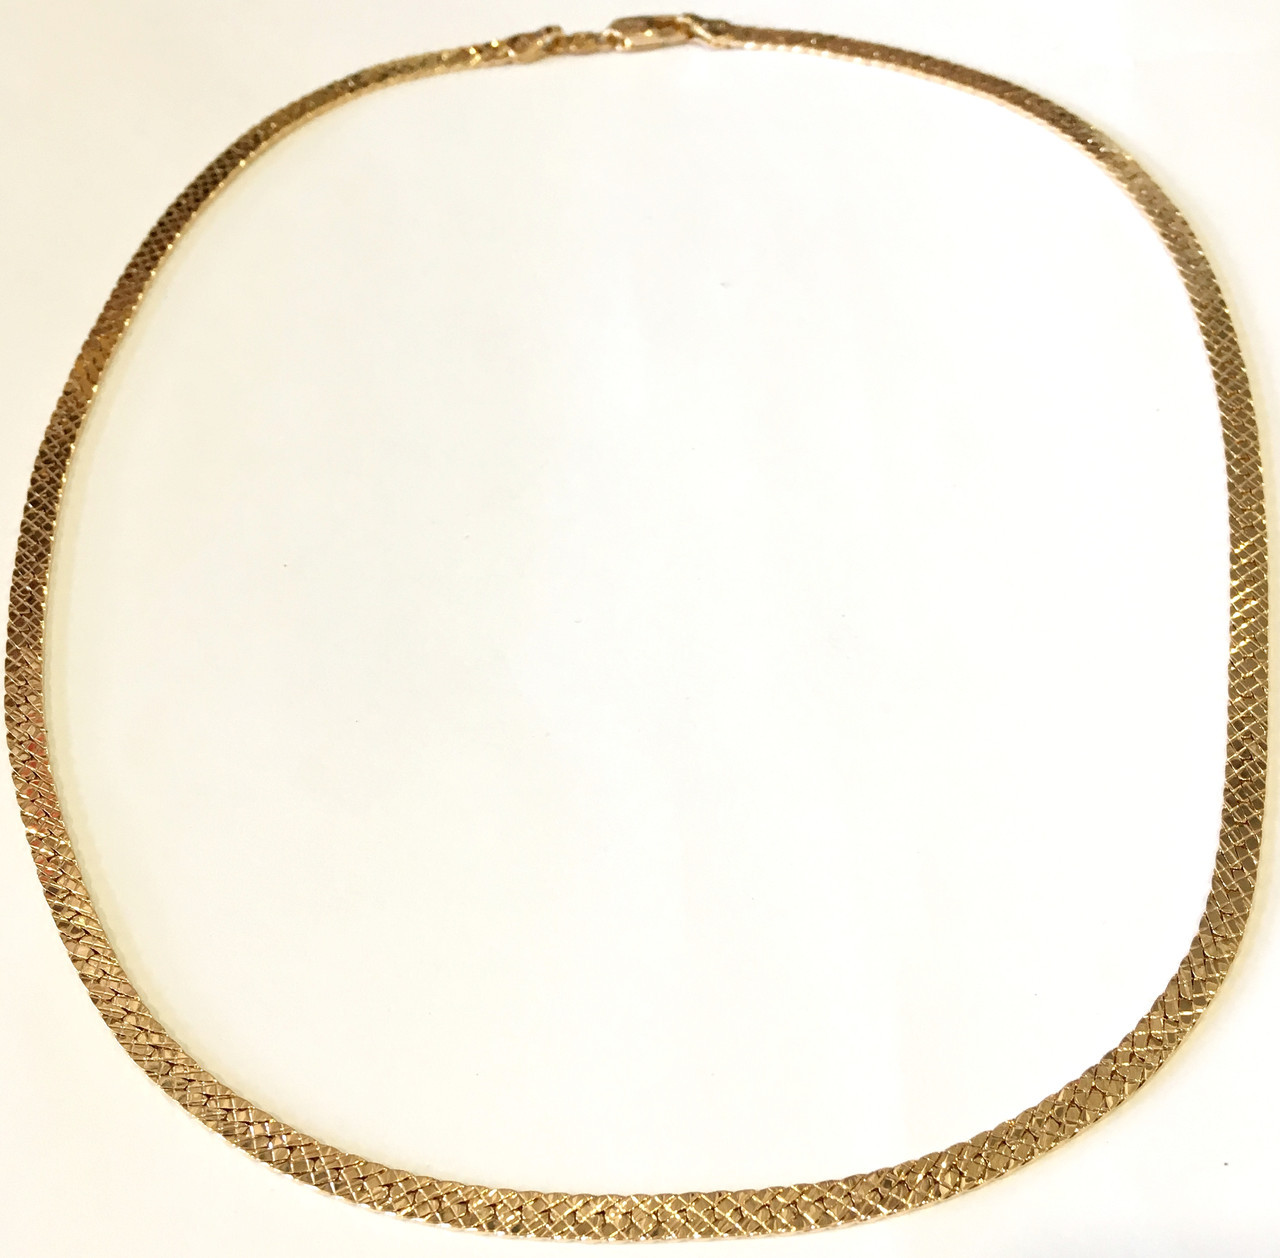 Колье Чешуя,  диаметр 15 см